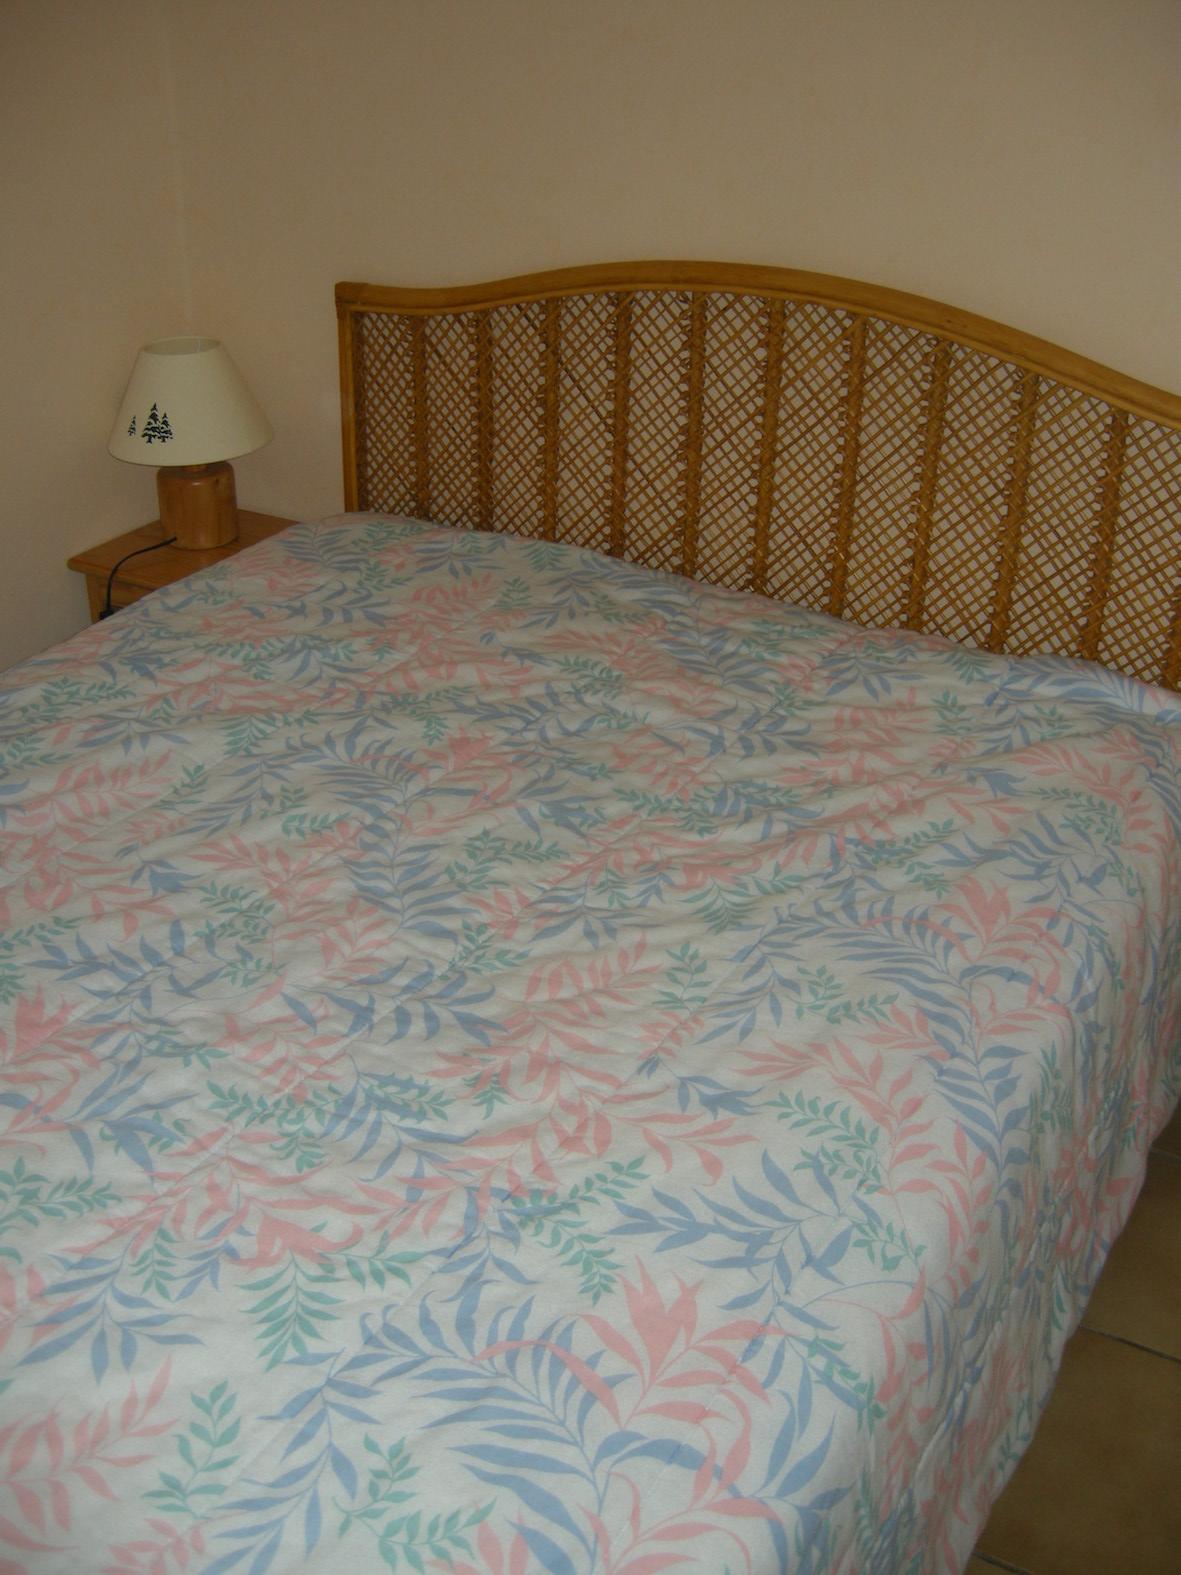 Chalet Pistes - Bedroom 2